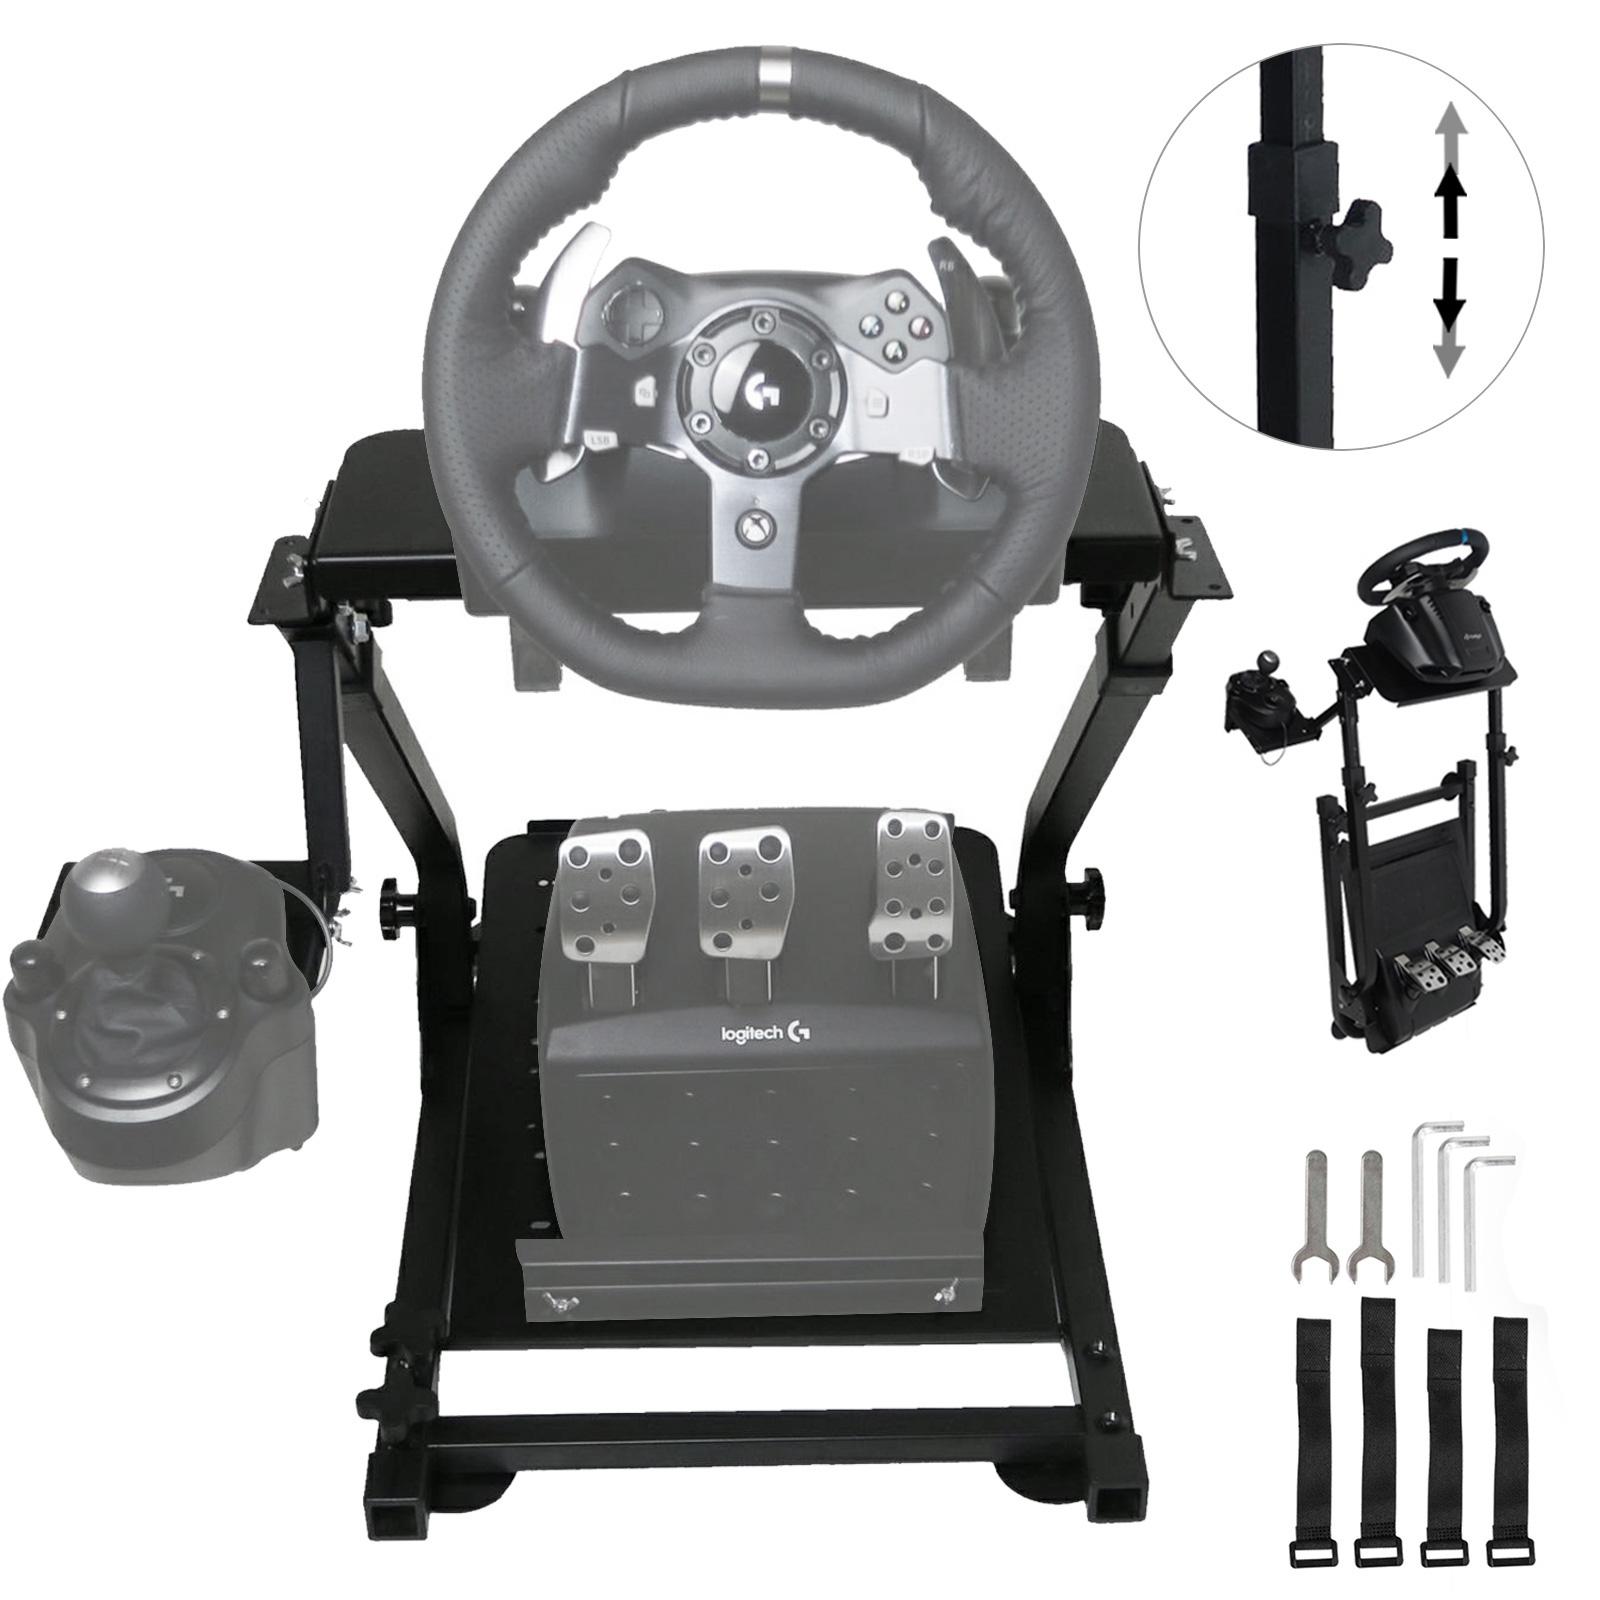 4db4ecc8afa Details about Racing Simulator Steering Wheel Stand Logitech G920  Thrustmaster Mount V2